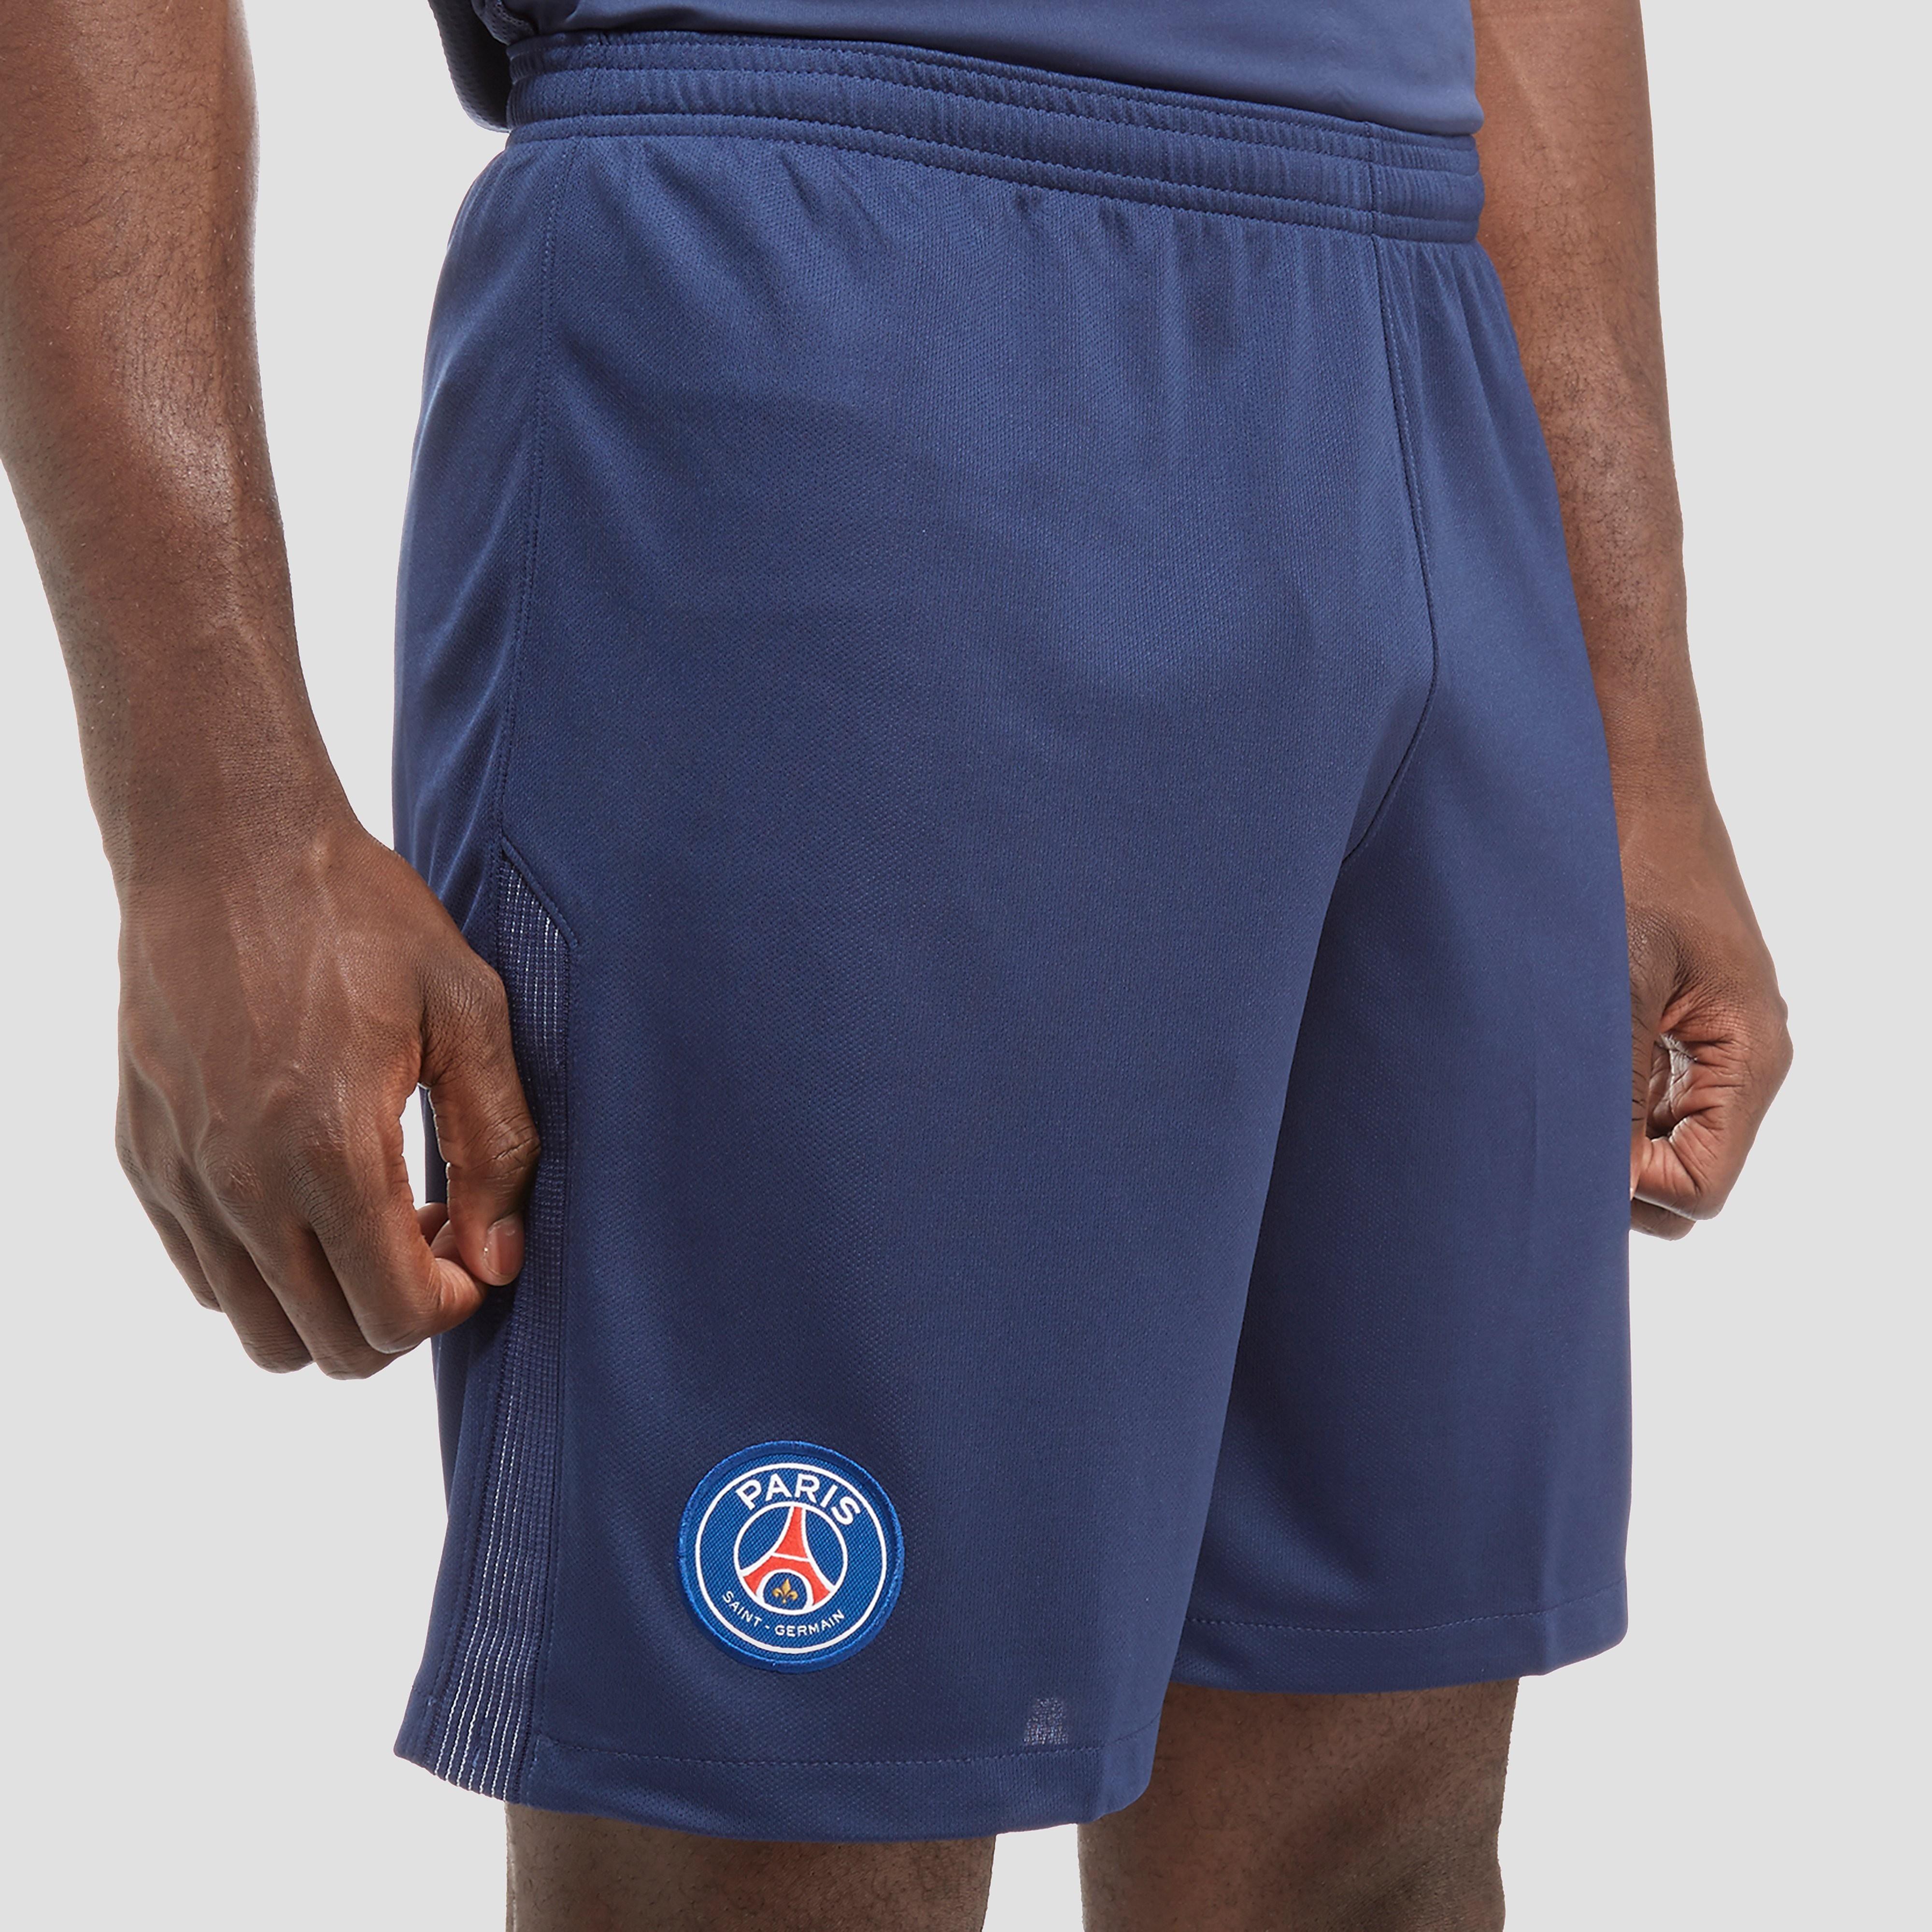 Nike Paris Saint Germain 2017/18 Men's Home Shorts